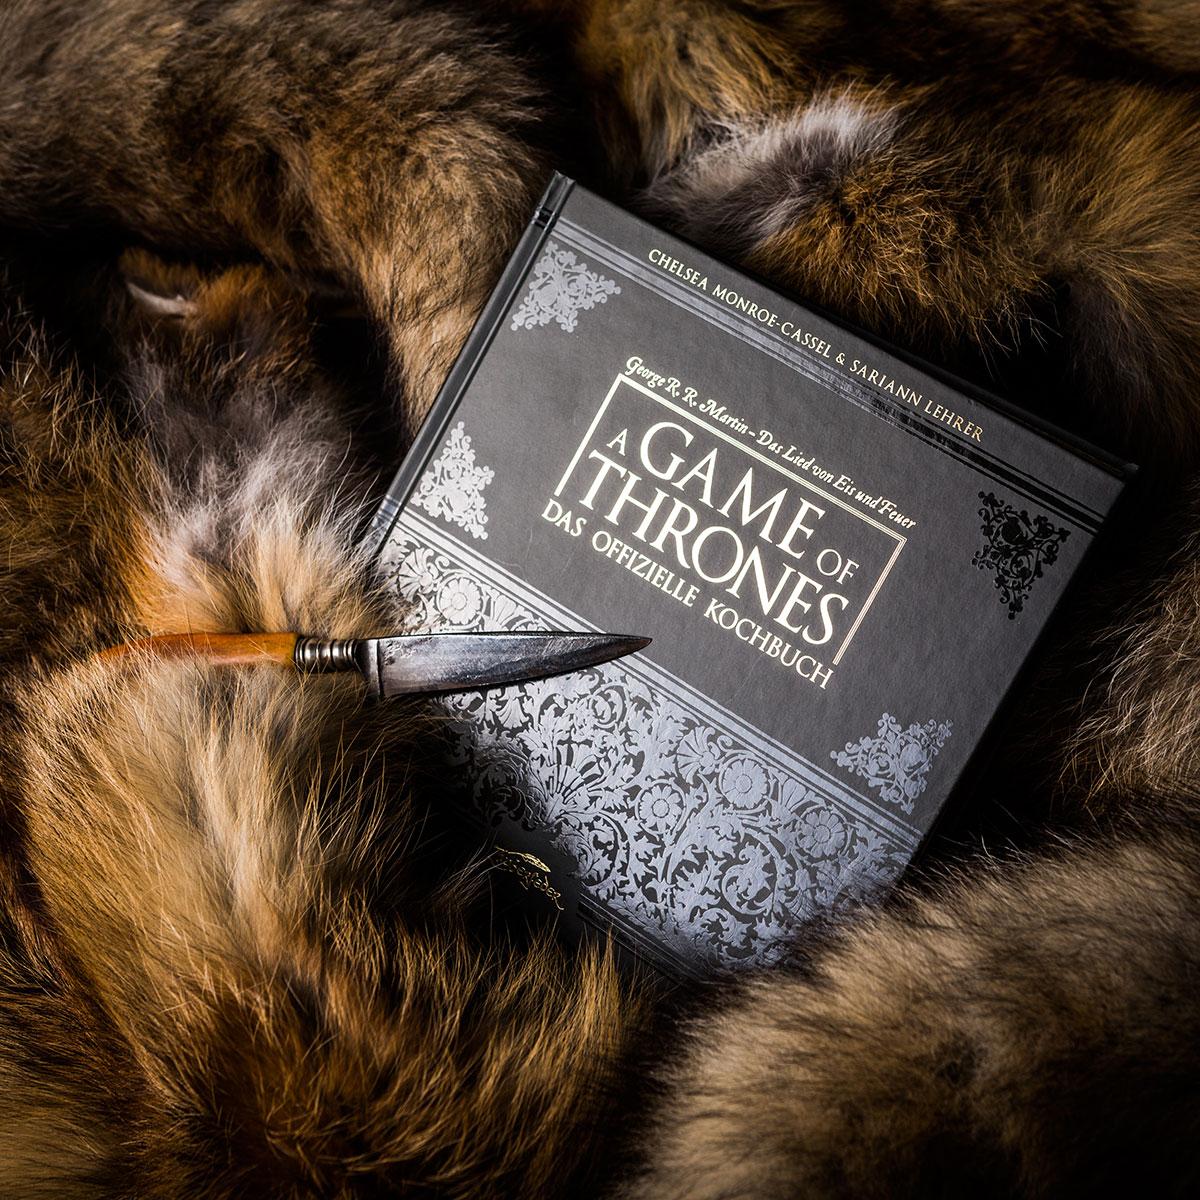 A Game of Thrones Das offizielle Kochbuch